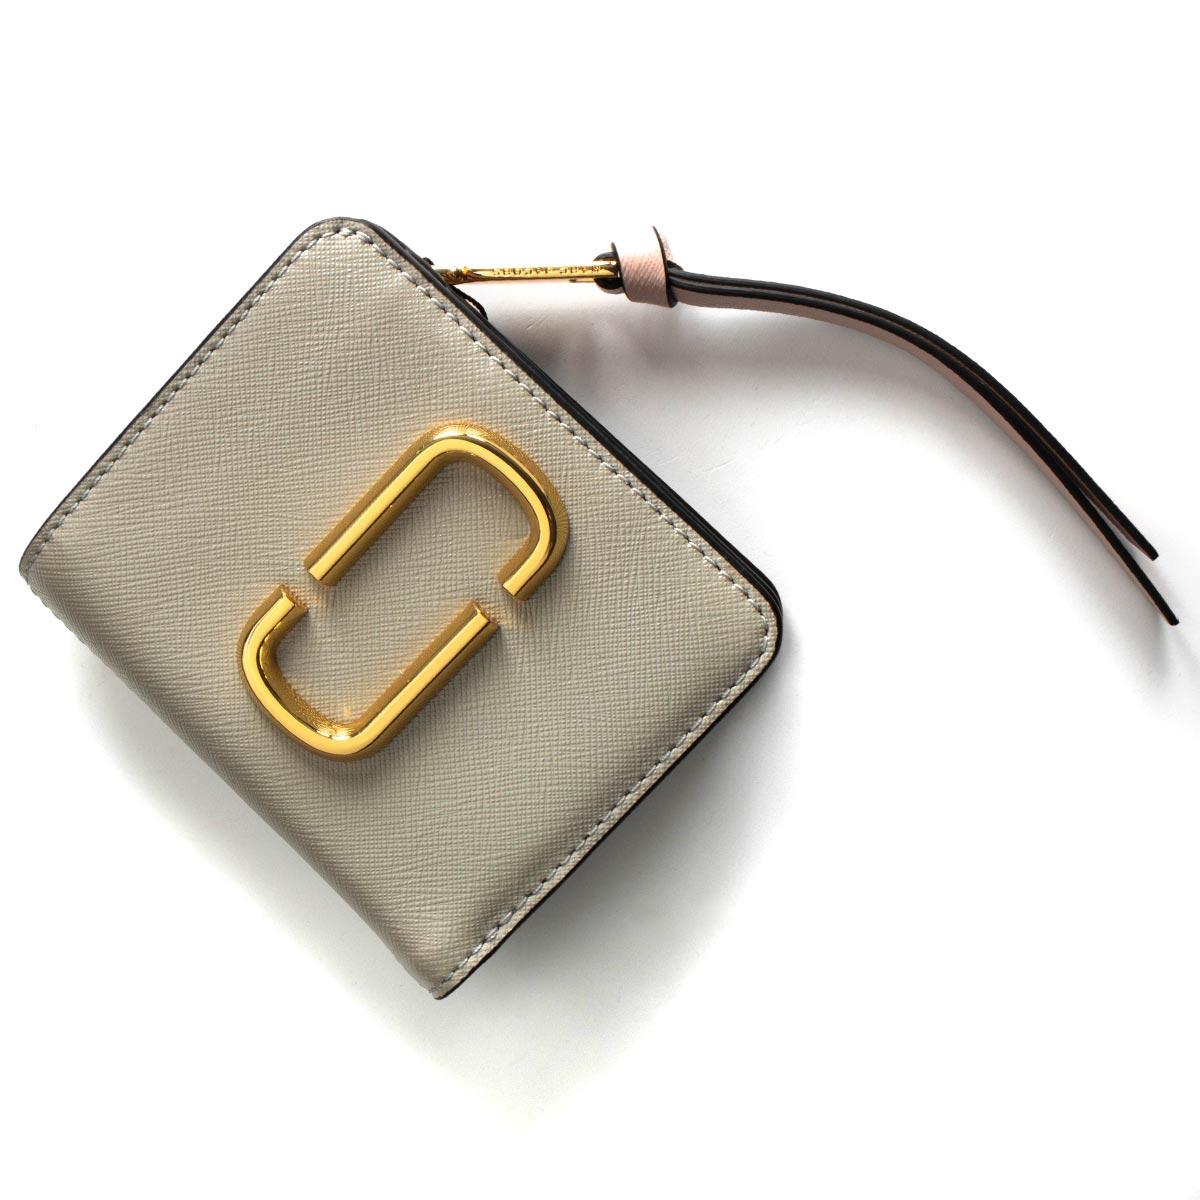 55979efe0b57 マークジェイコブス 二つ折り財布 財布 レディース スナップショット ダブルJロゴ ダストグレーマルチ M0014282